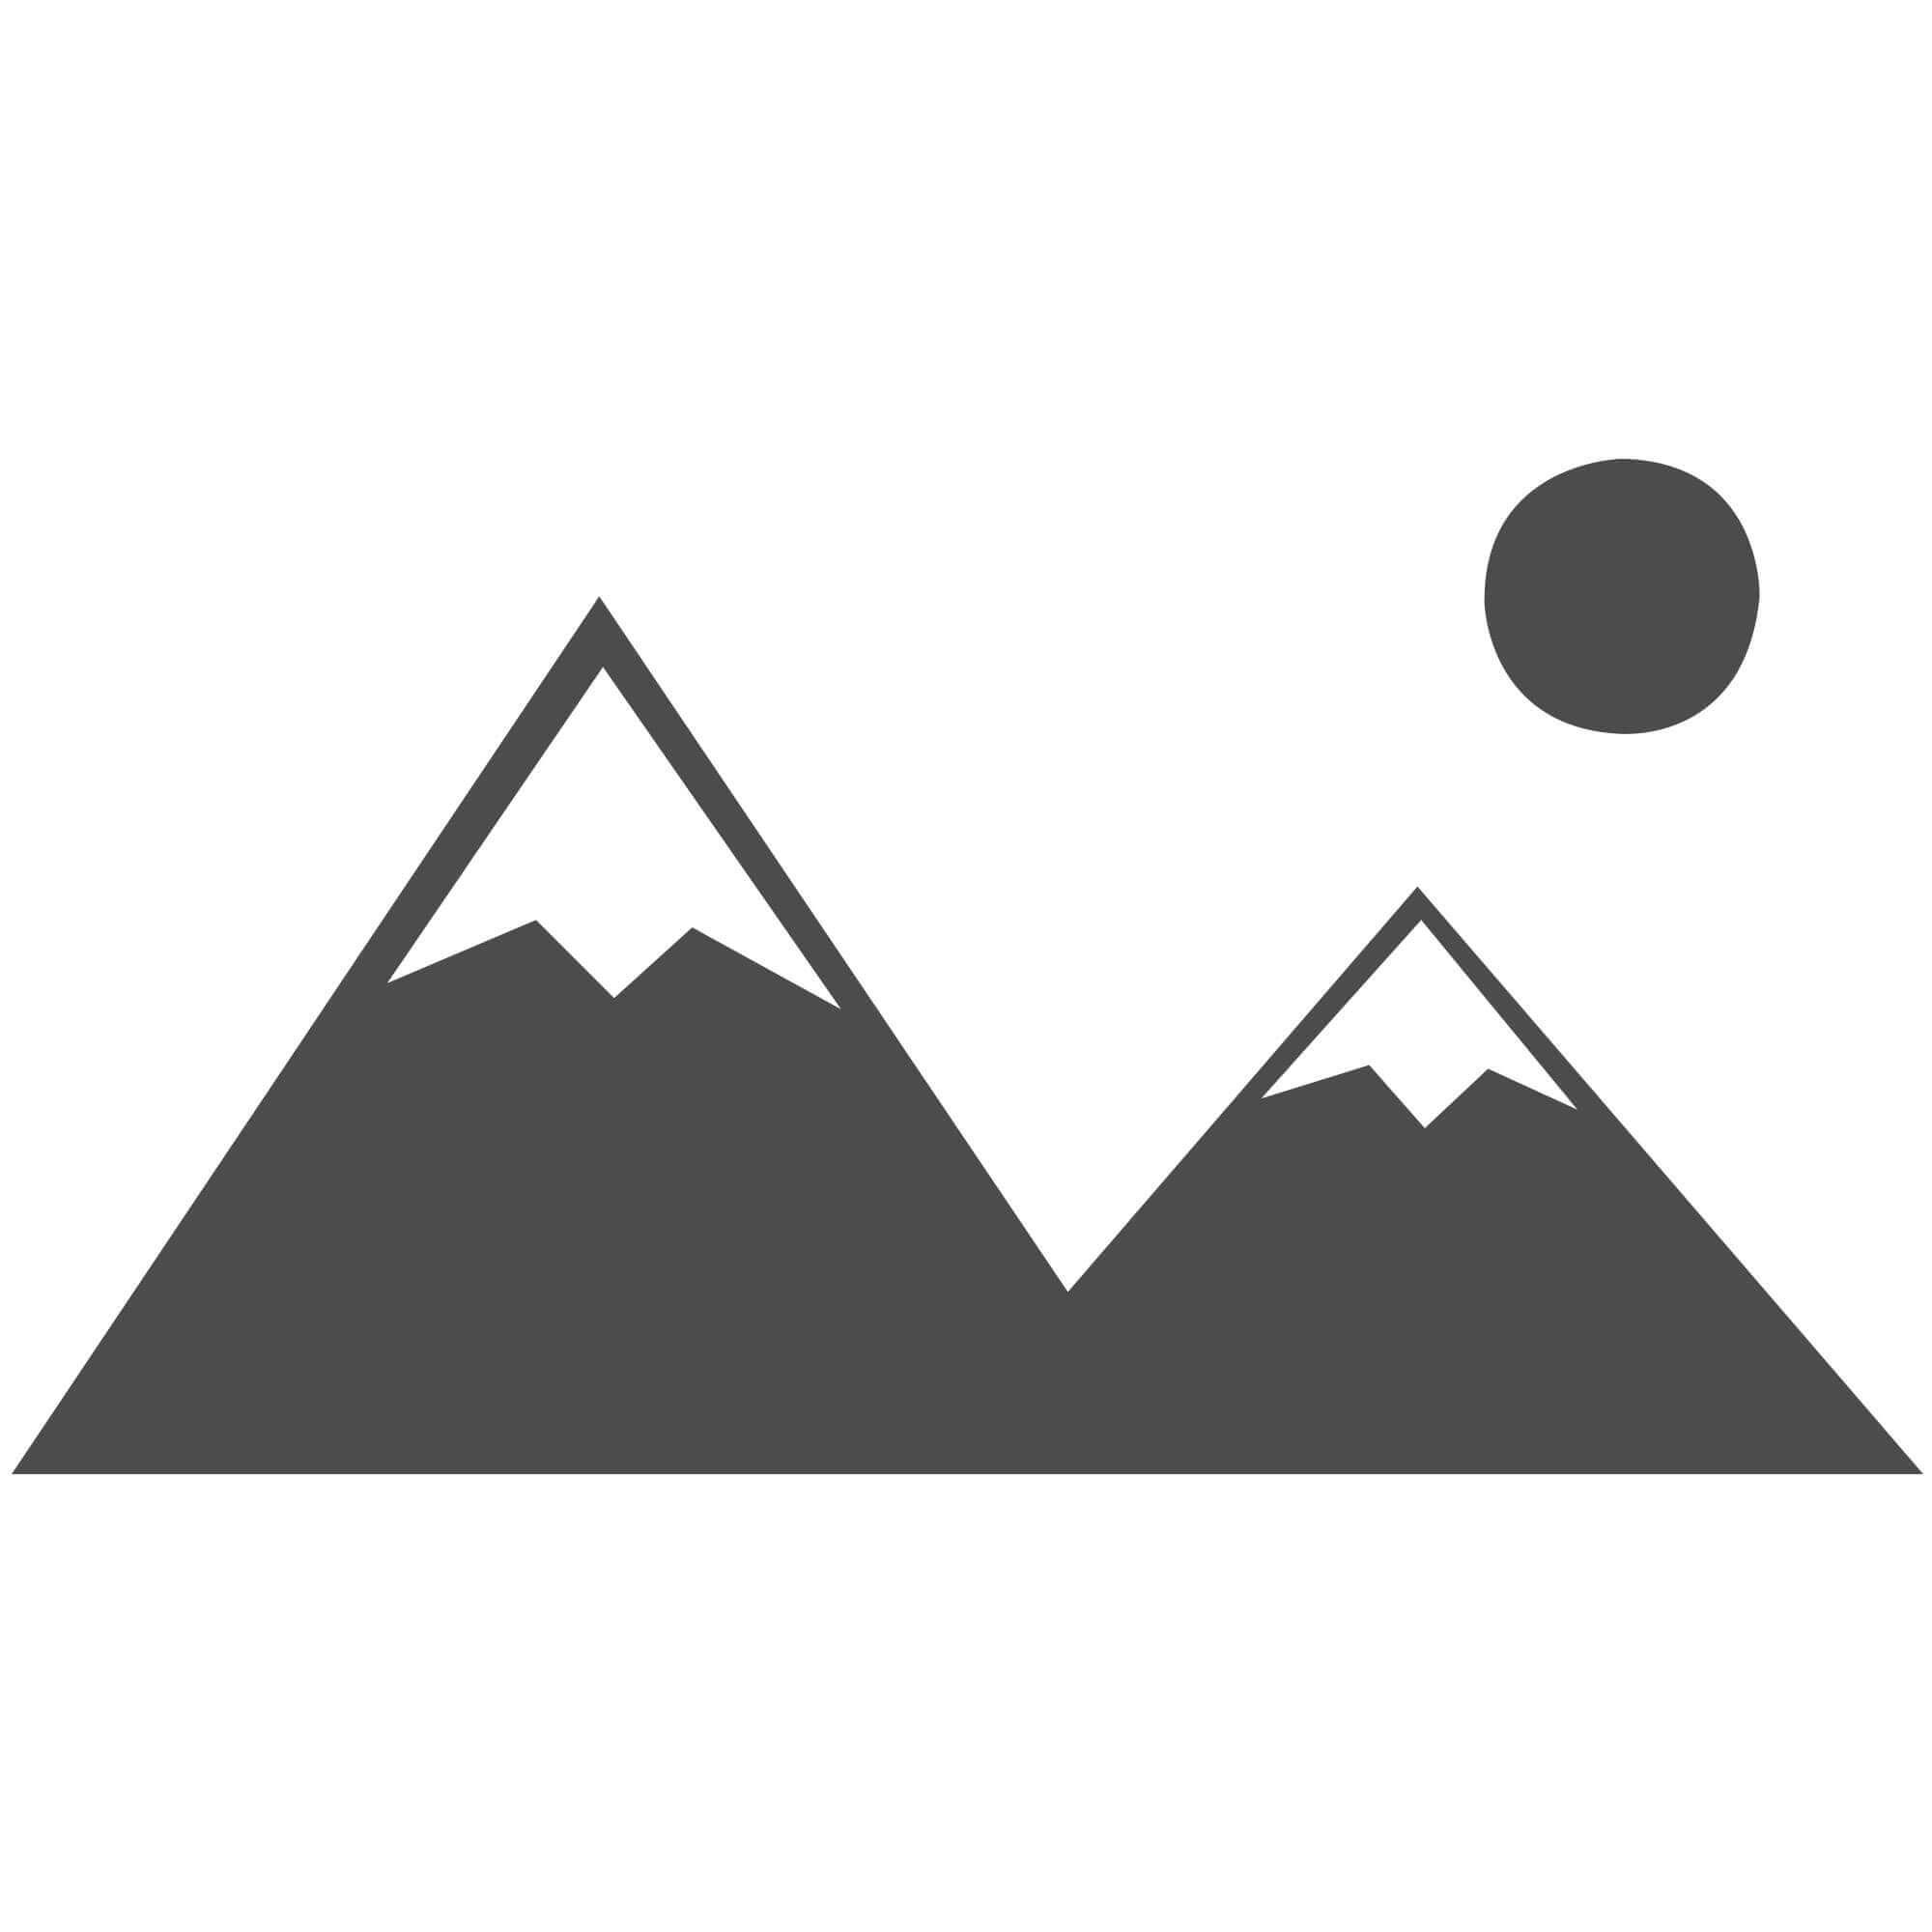 "Velvet Shaggy Rug - Ivory - Size 80 x 150 cm (2'8"" x 5')"